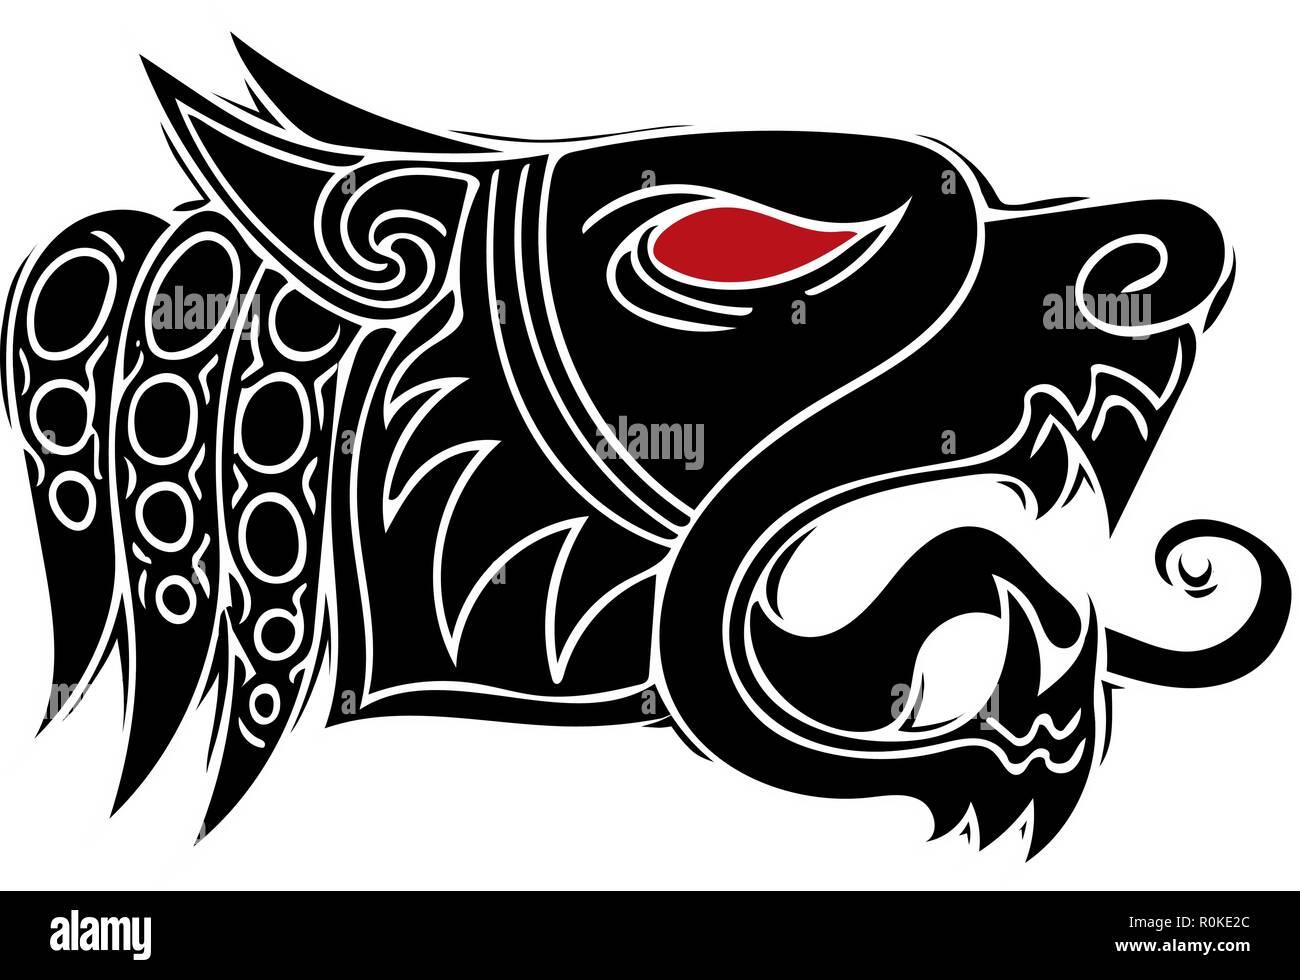 La Cabeza Del Lobo Aullido Diseño De Tatuaje Tribal Vector